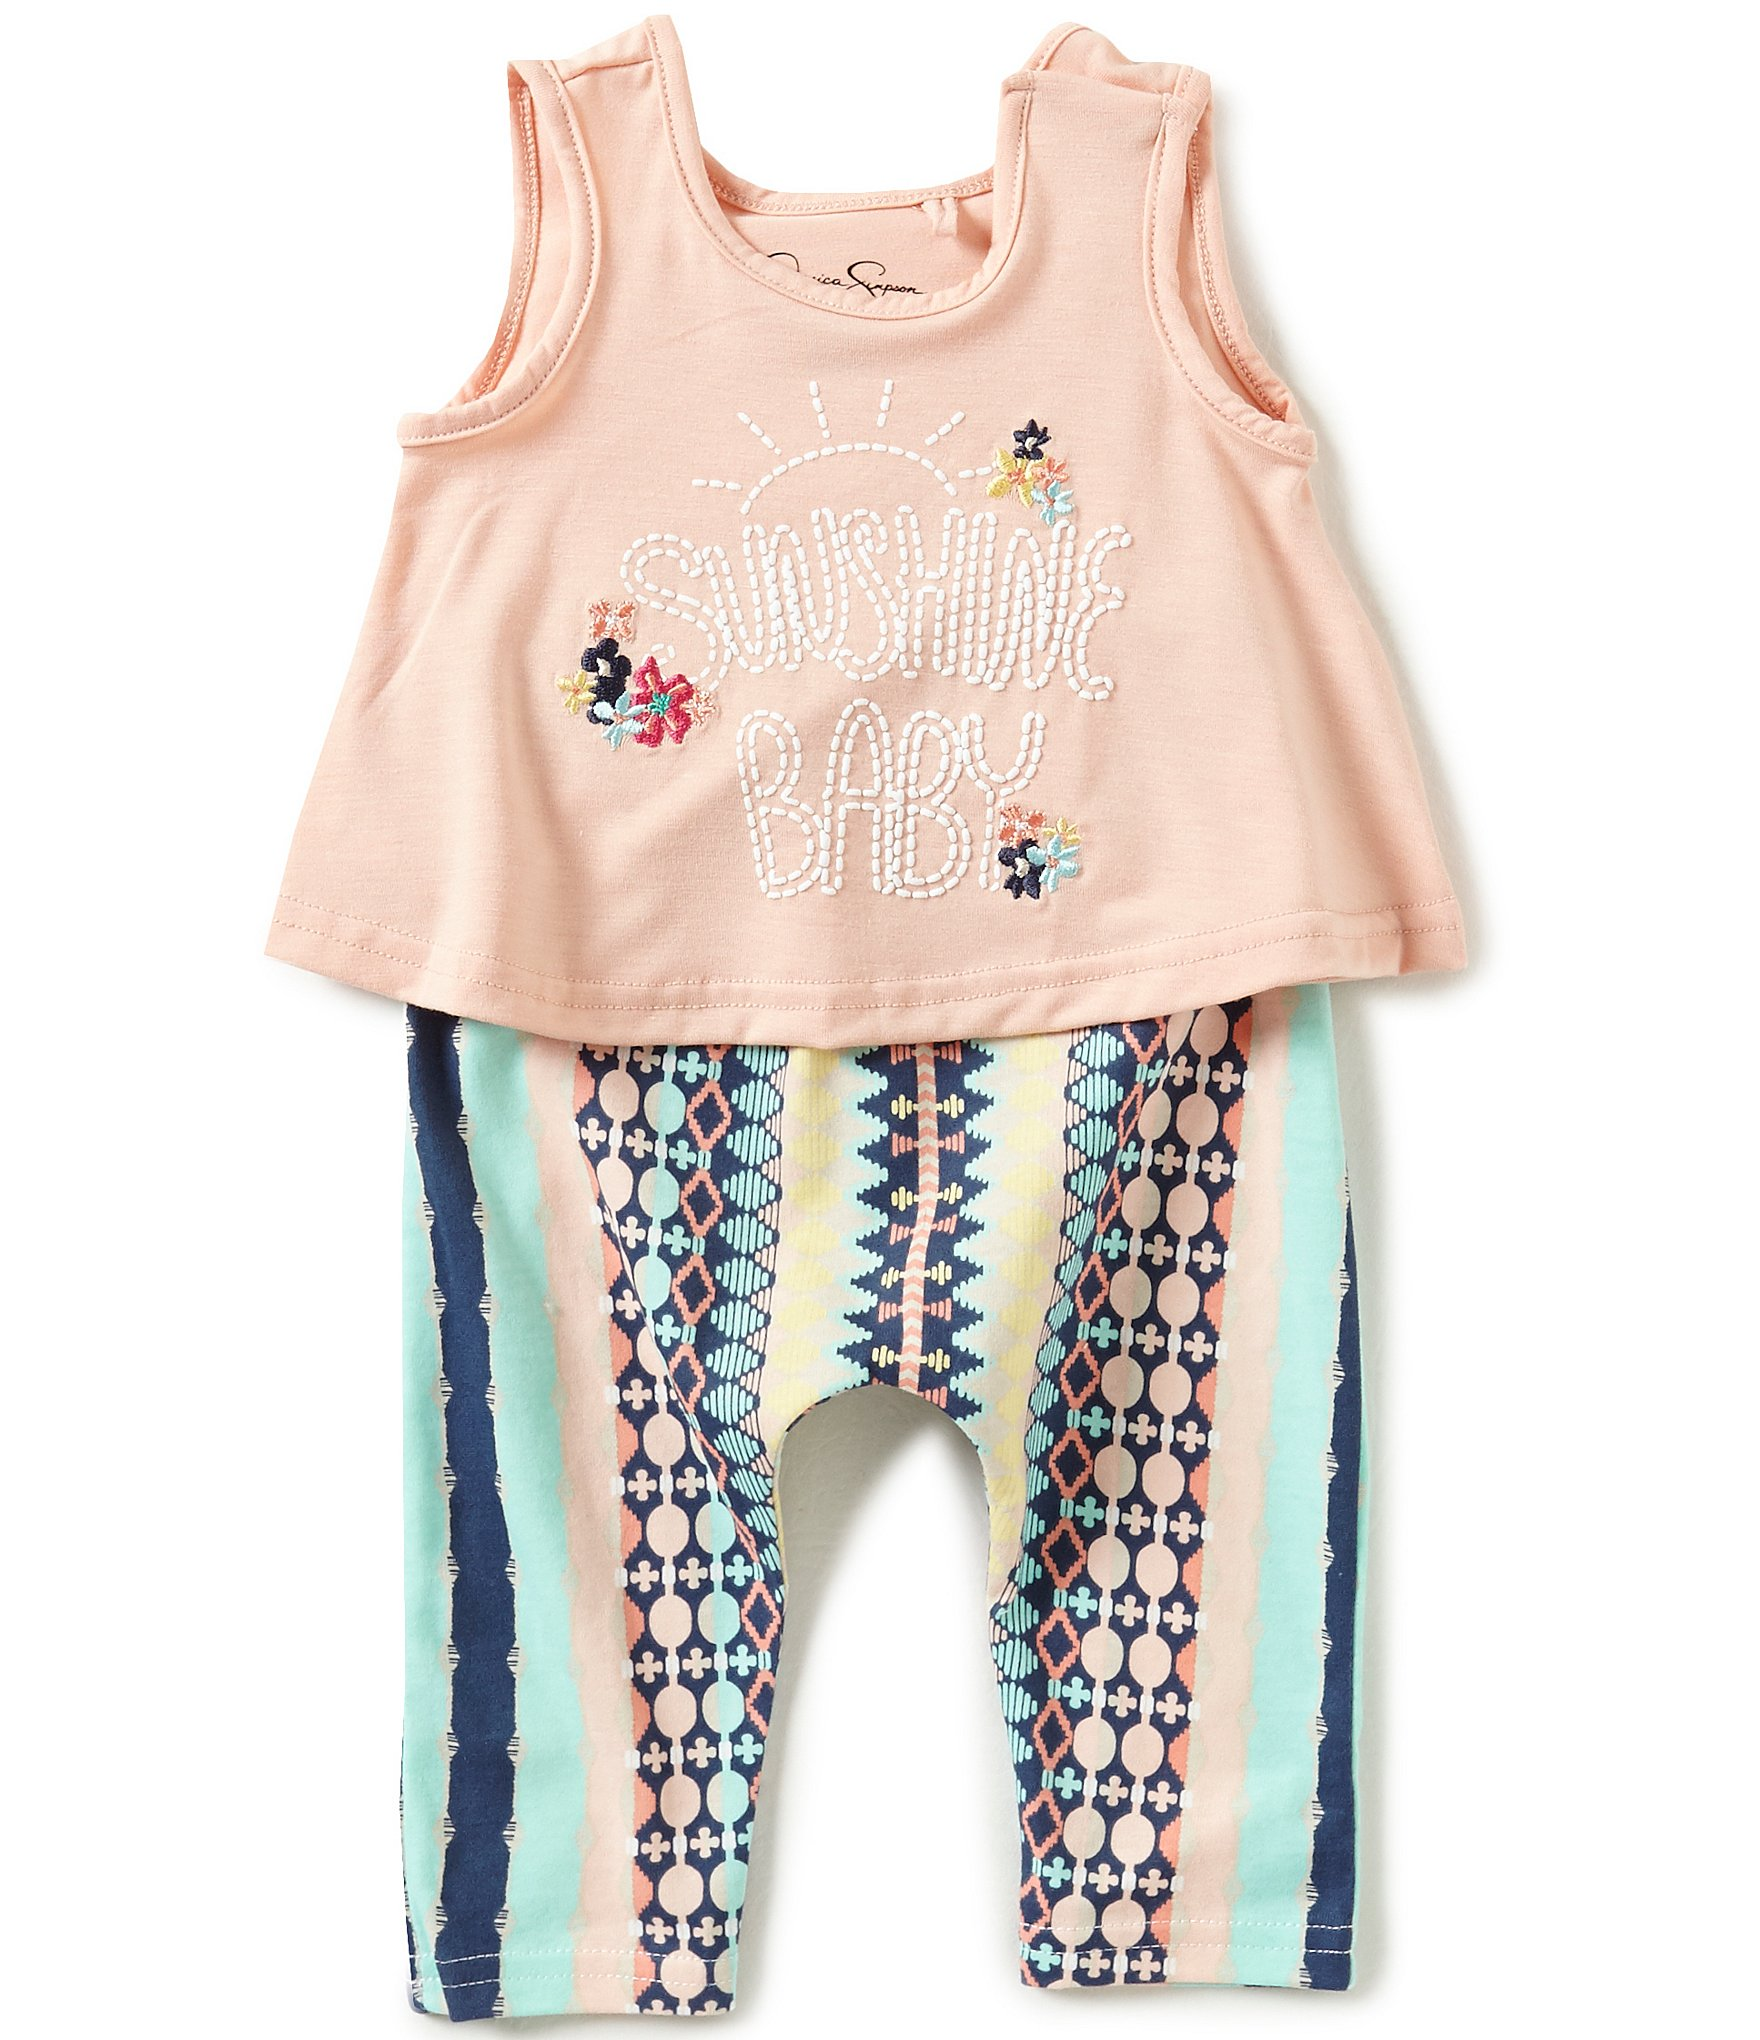 Jessica Simpson Baby Girls 0 9 Months Sunshine Baby Tank